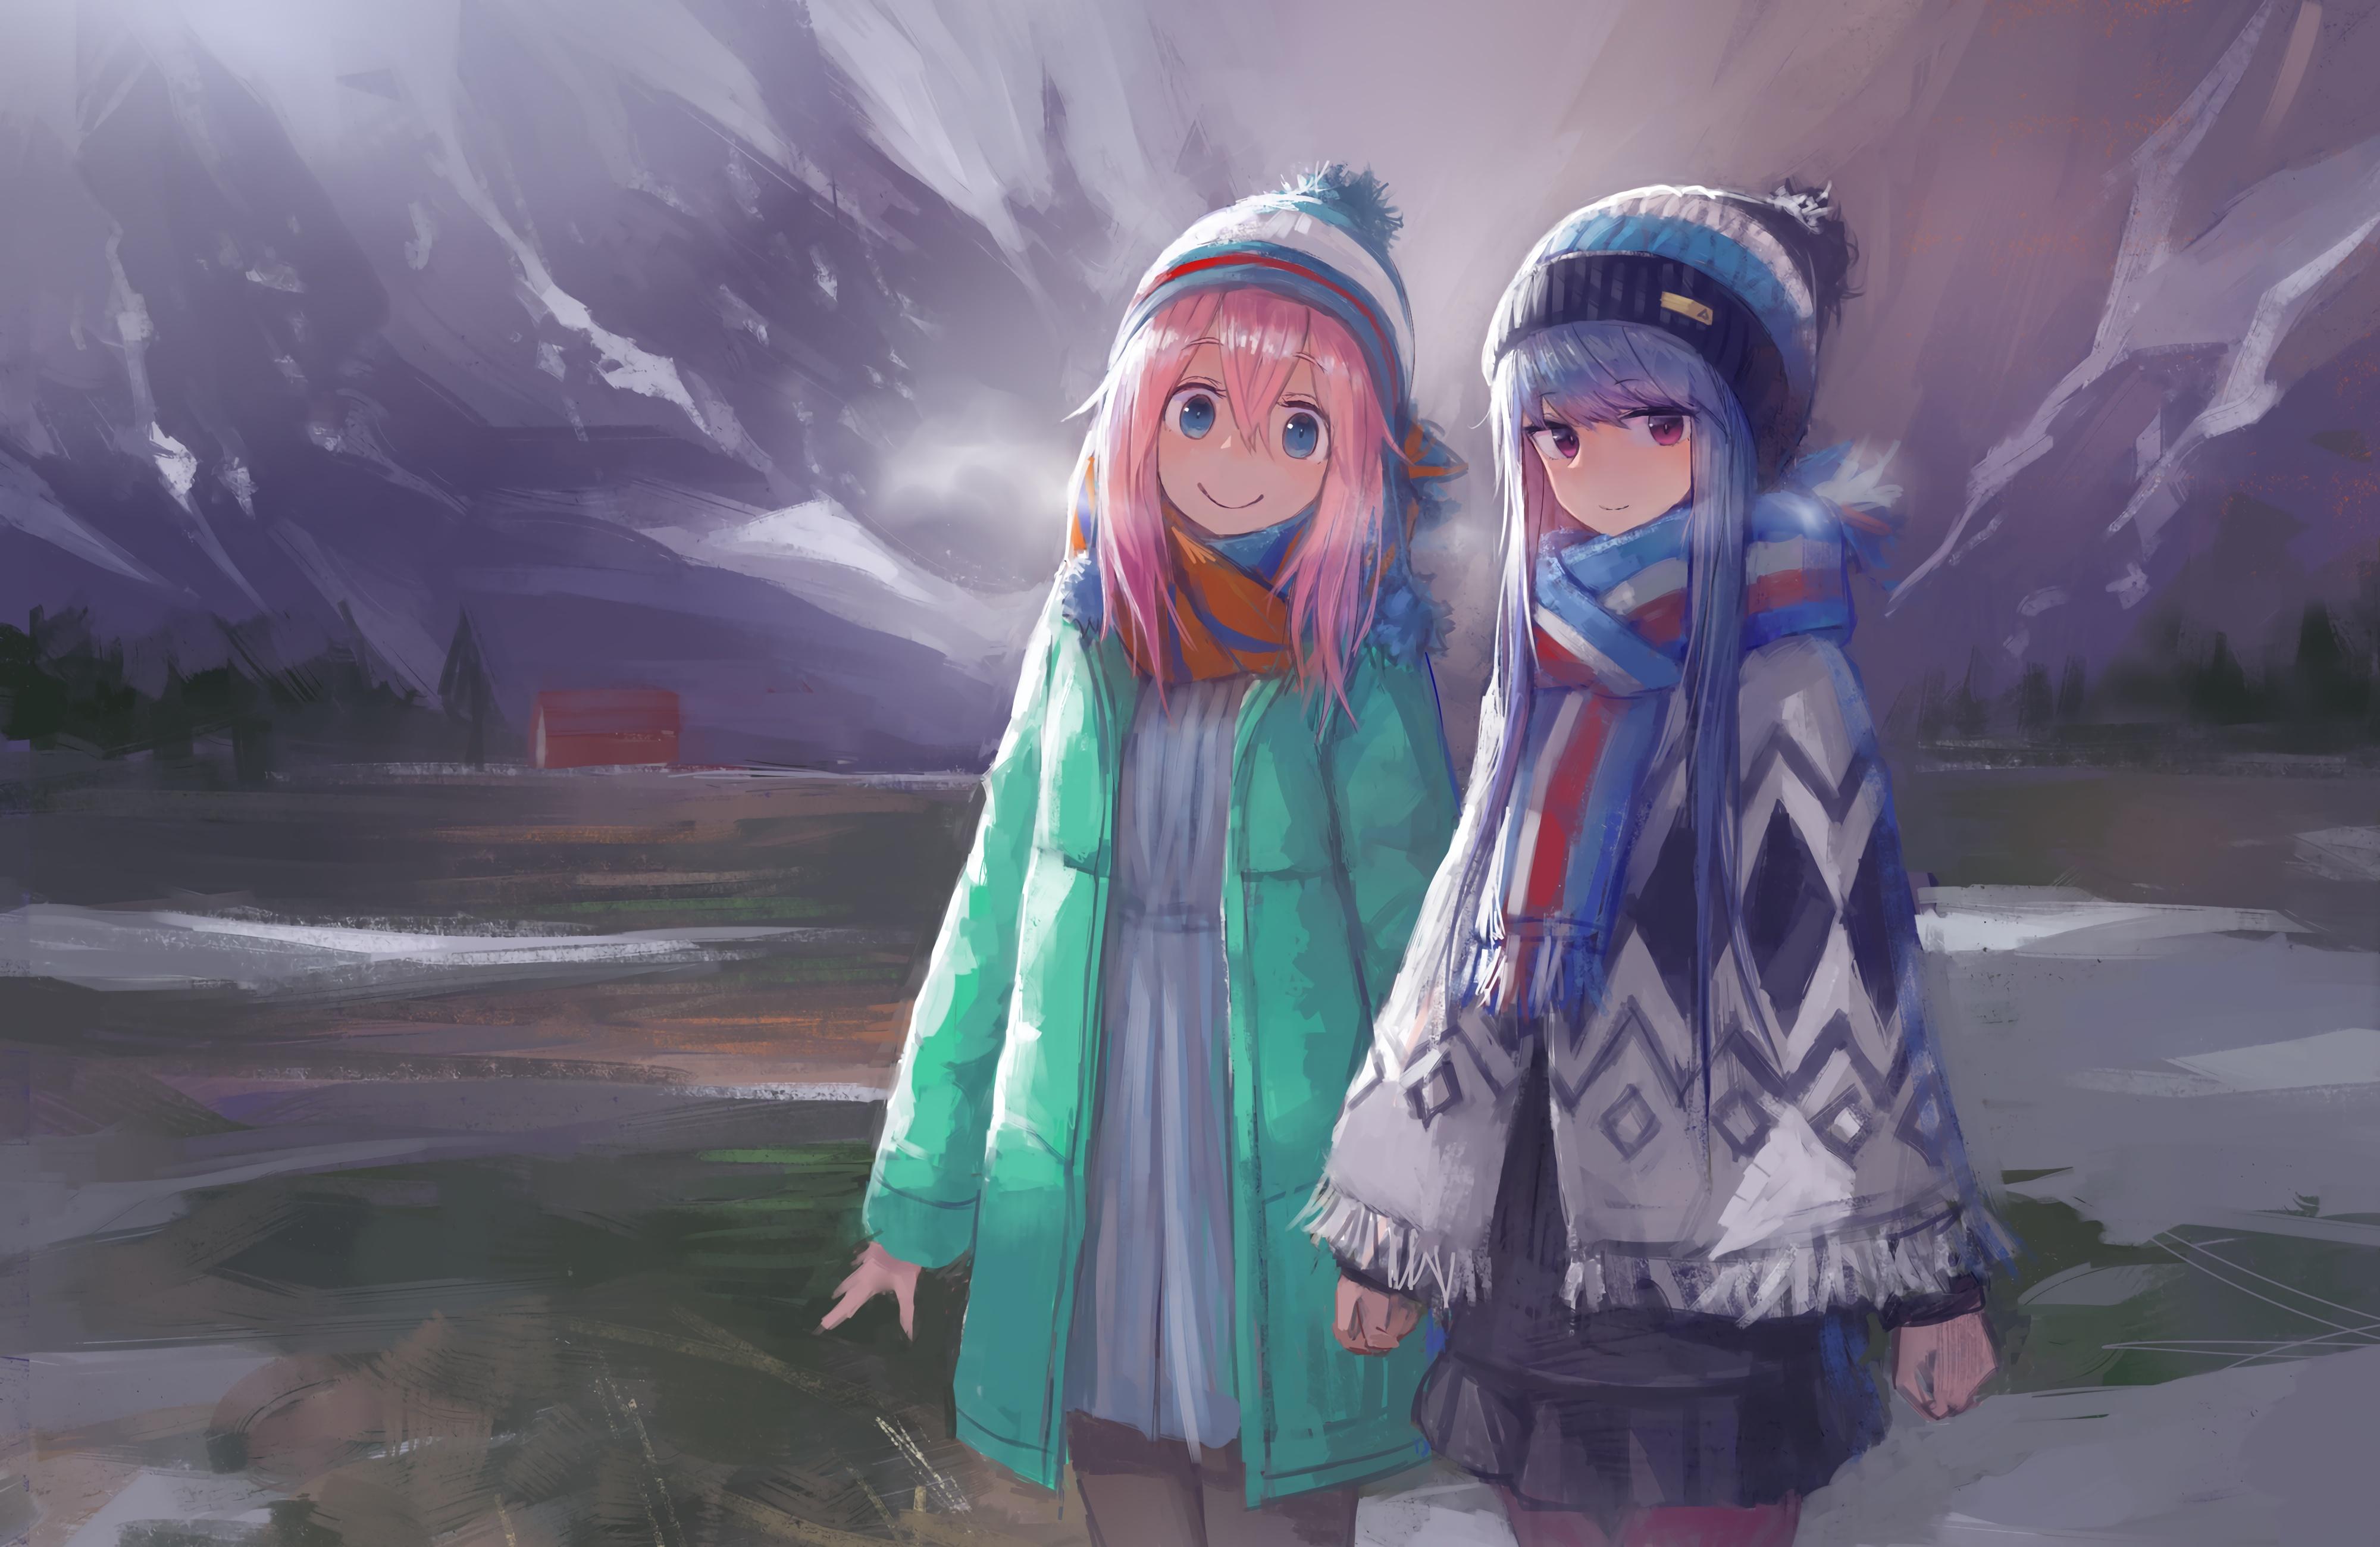 Anime Girl Smile cool wallpaper